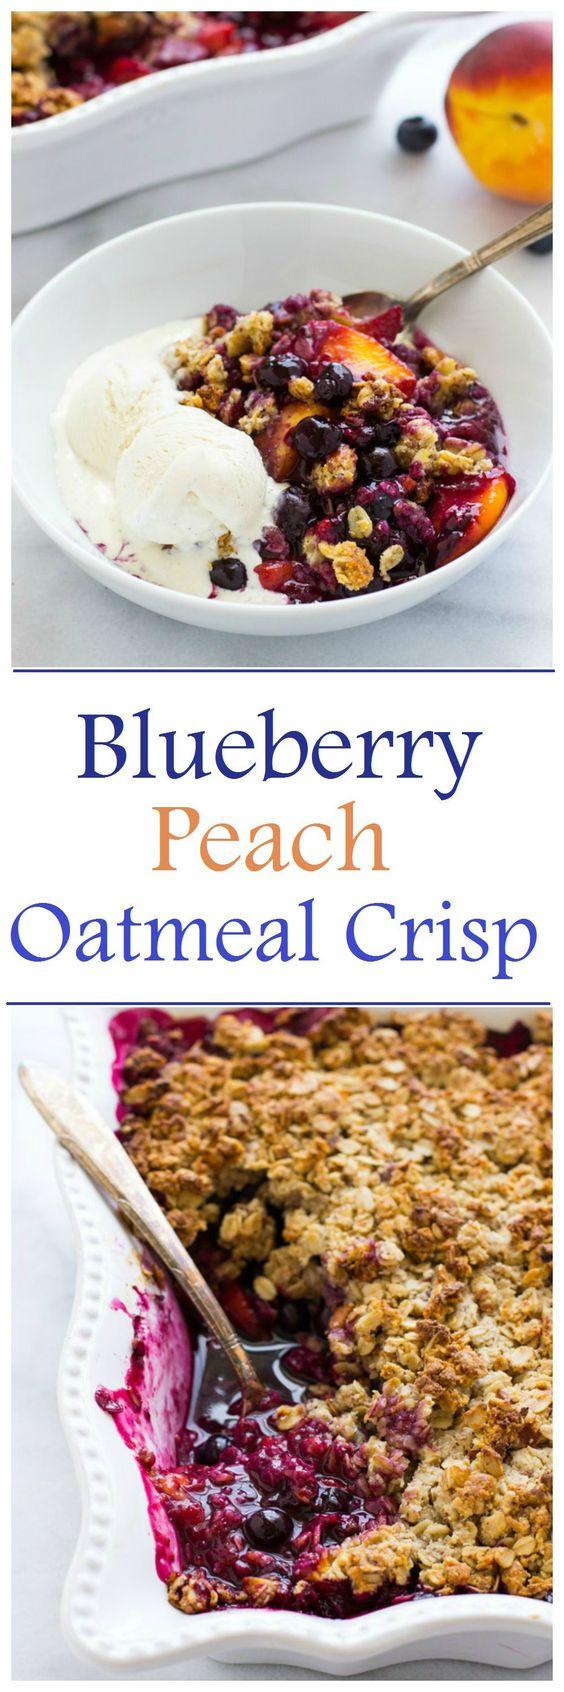 Blueberry Peach Oatmeal Crisp- the perfect summer dessert! #refinedsugarfree #glutenfree #dairyfree                                                                                                                                                     Más